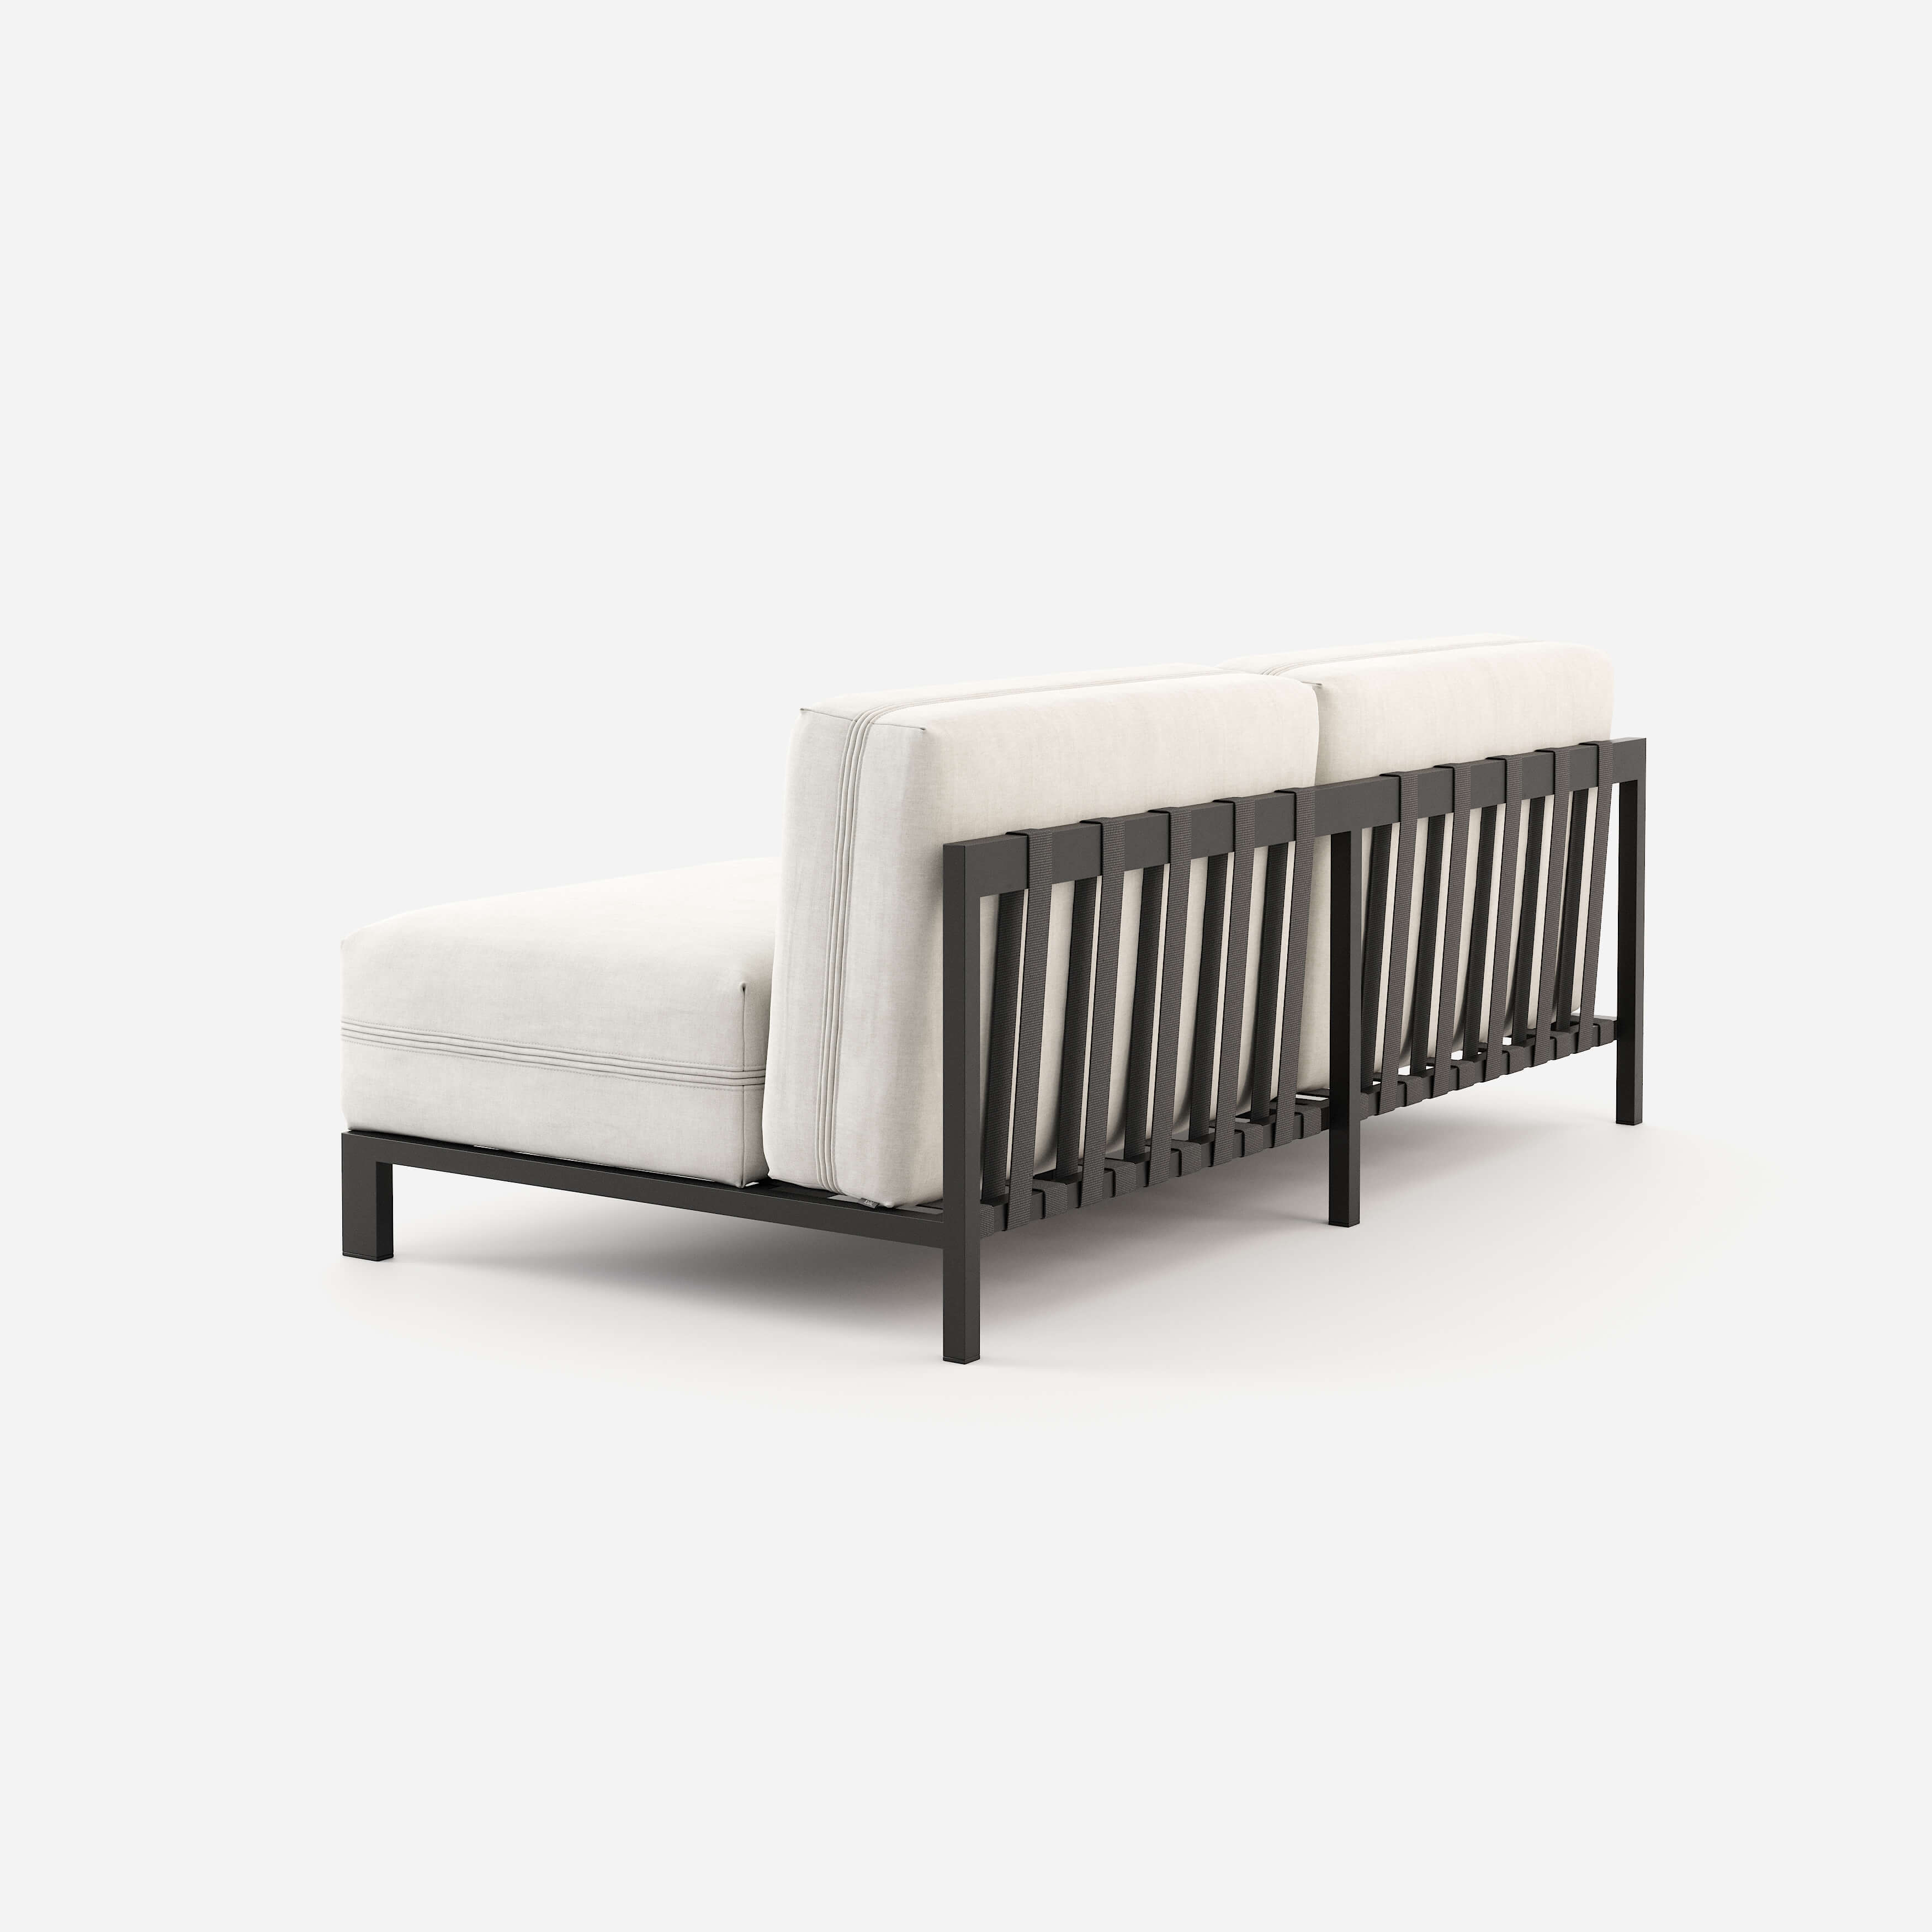 Bondi-Sofa-without-Armrest-domkapa-interior-design-white-furniture-upholstery-summer-trends-home-decor-4